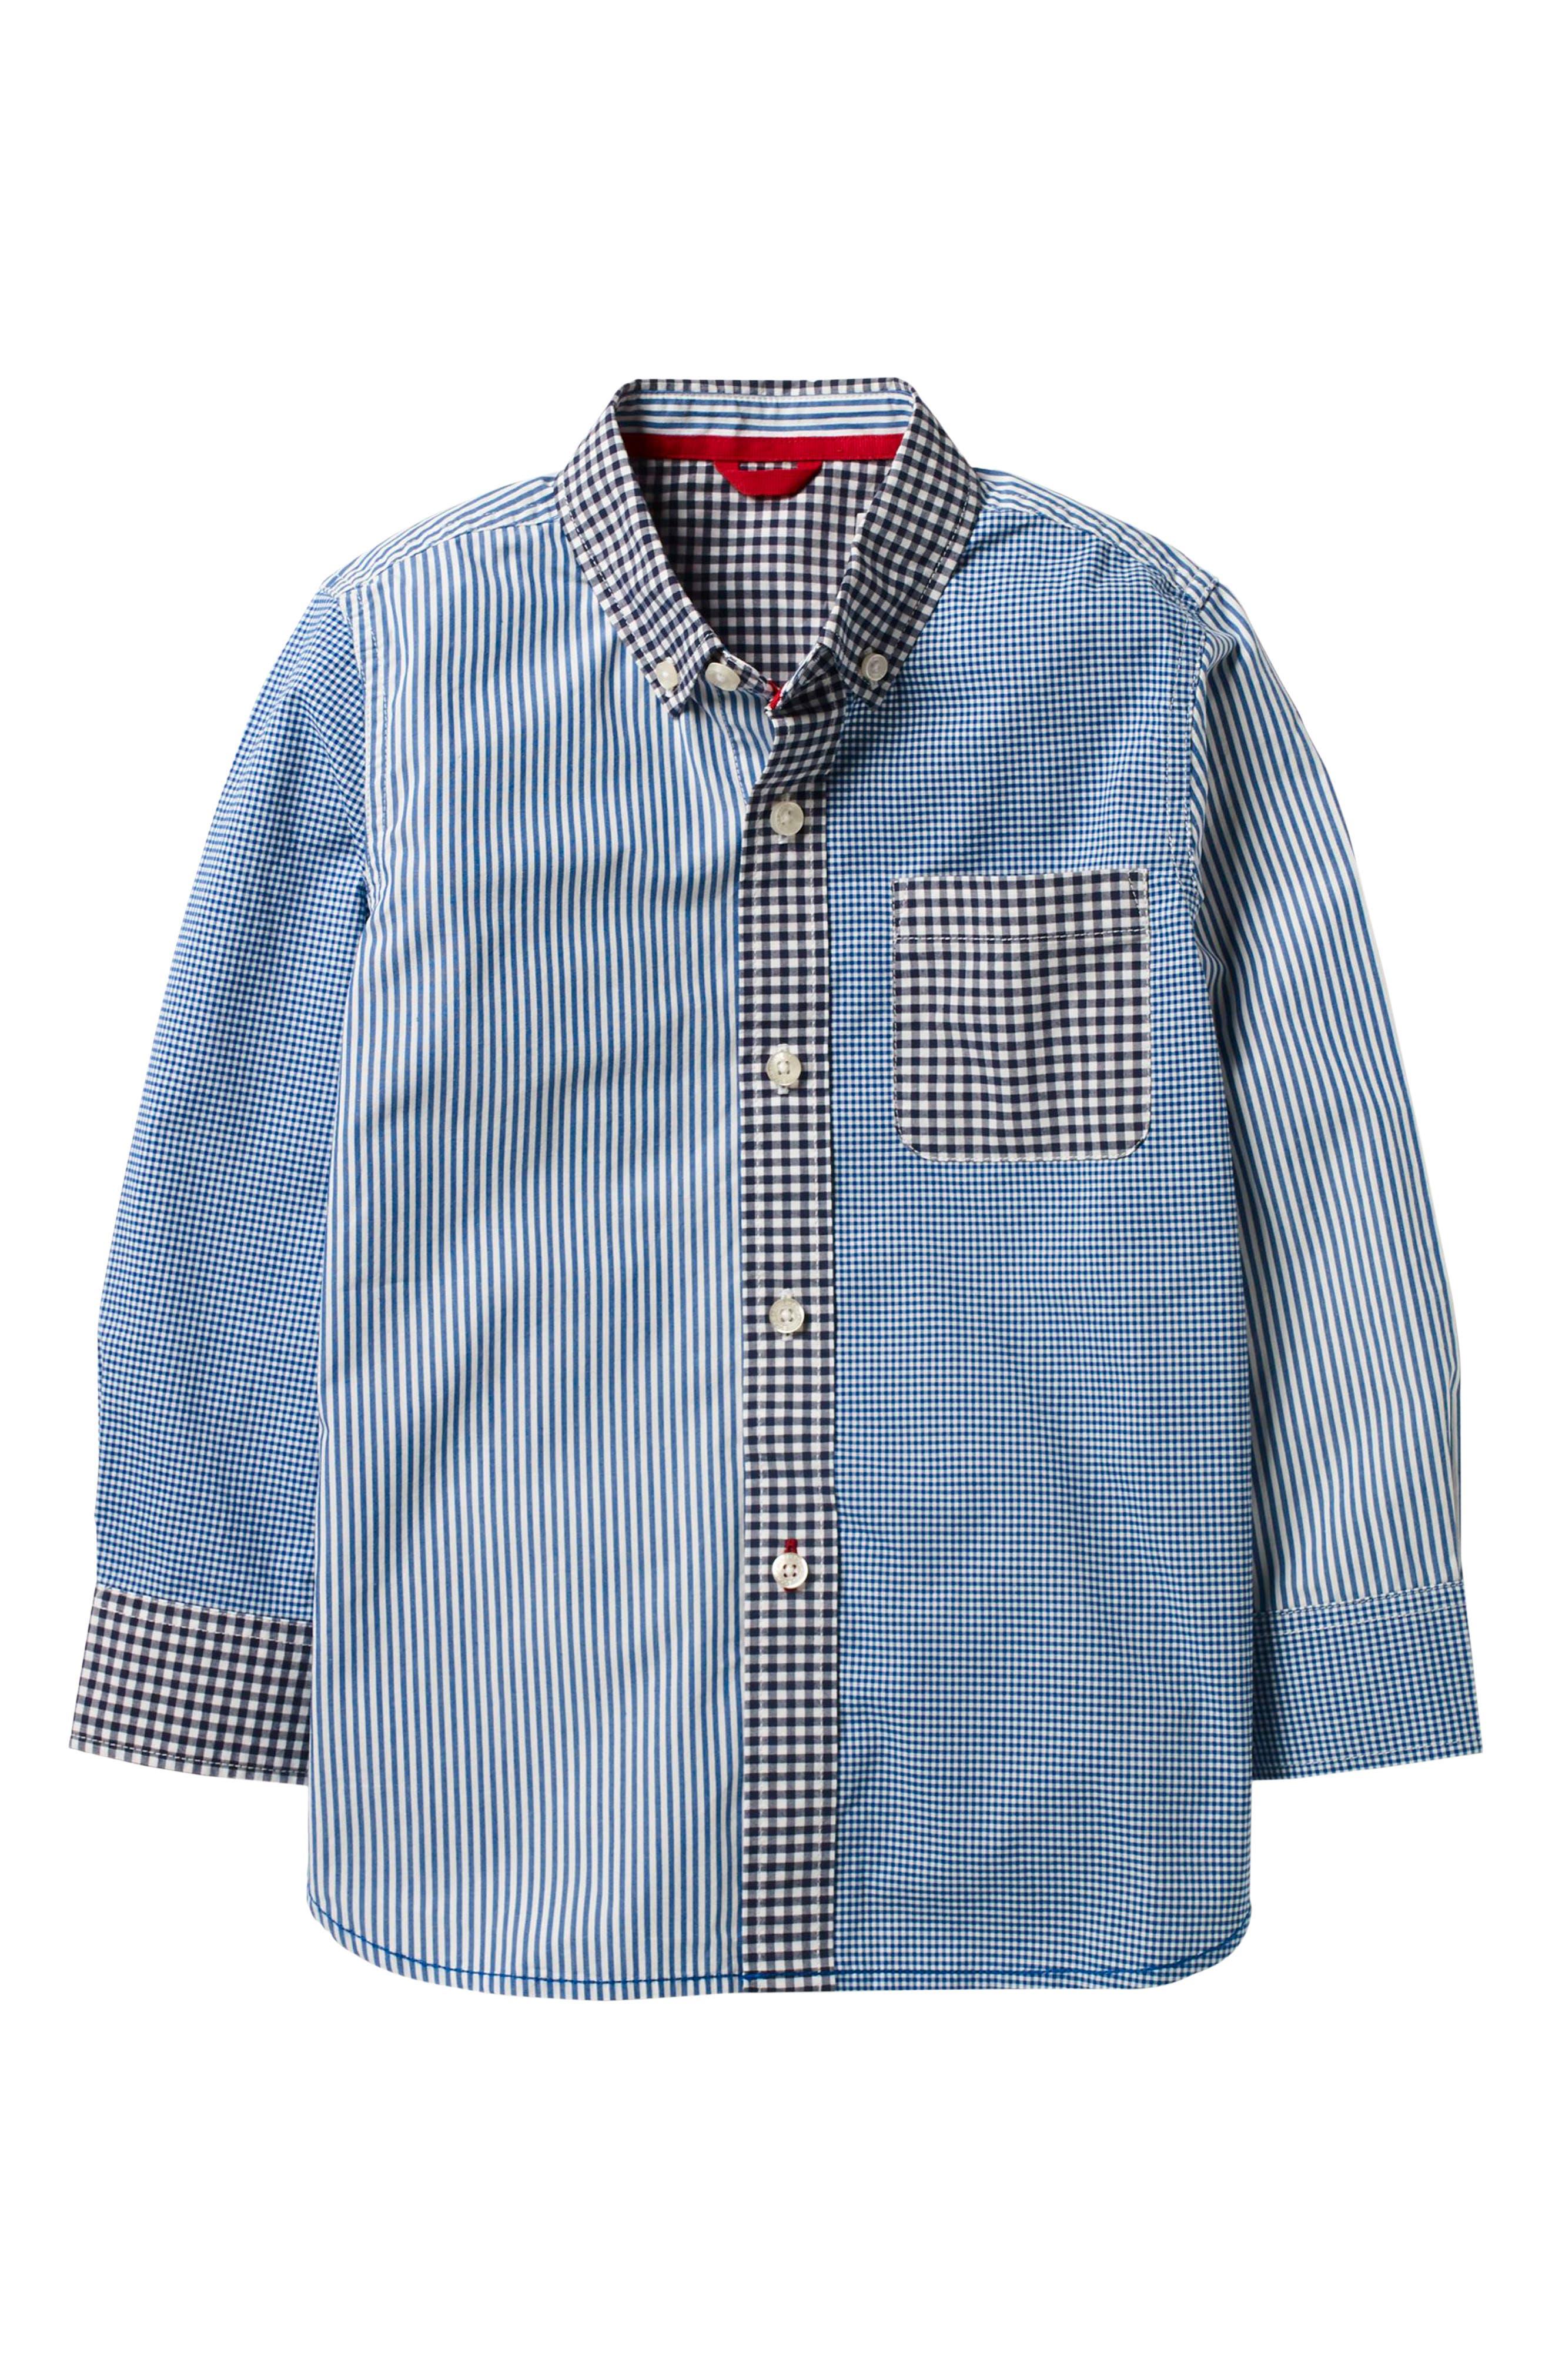 Mini Boden Hotchpotch Laundered Shirt (Toddler Boys, Little Boys & Big Boys)